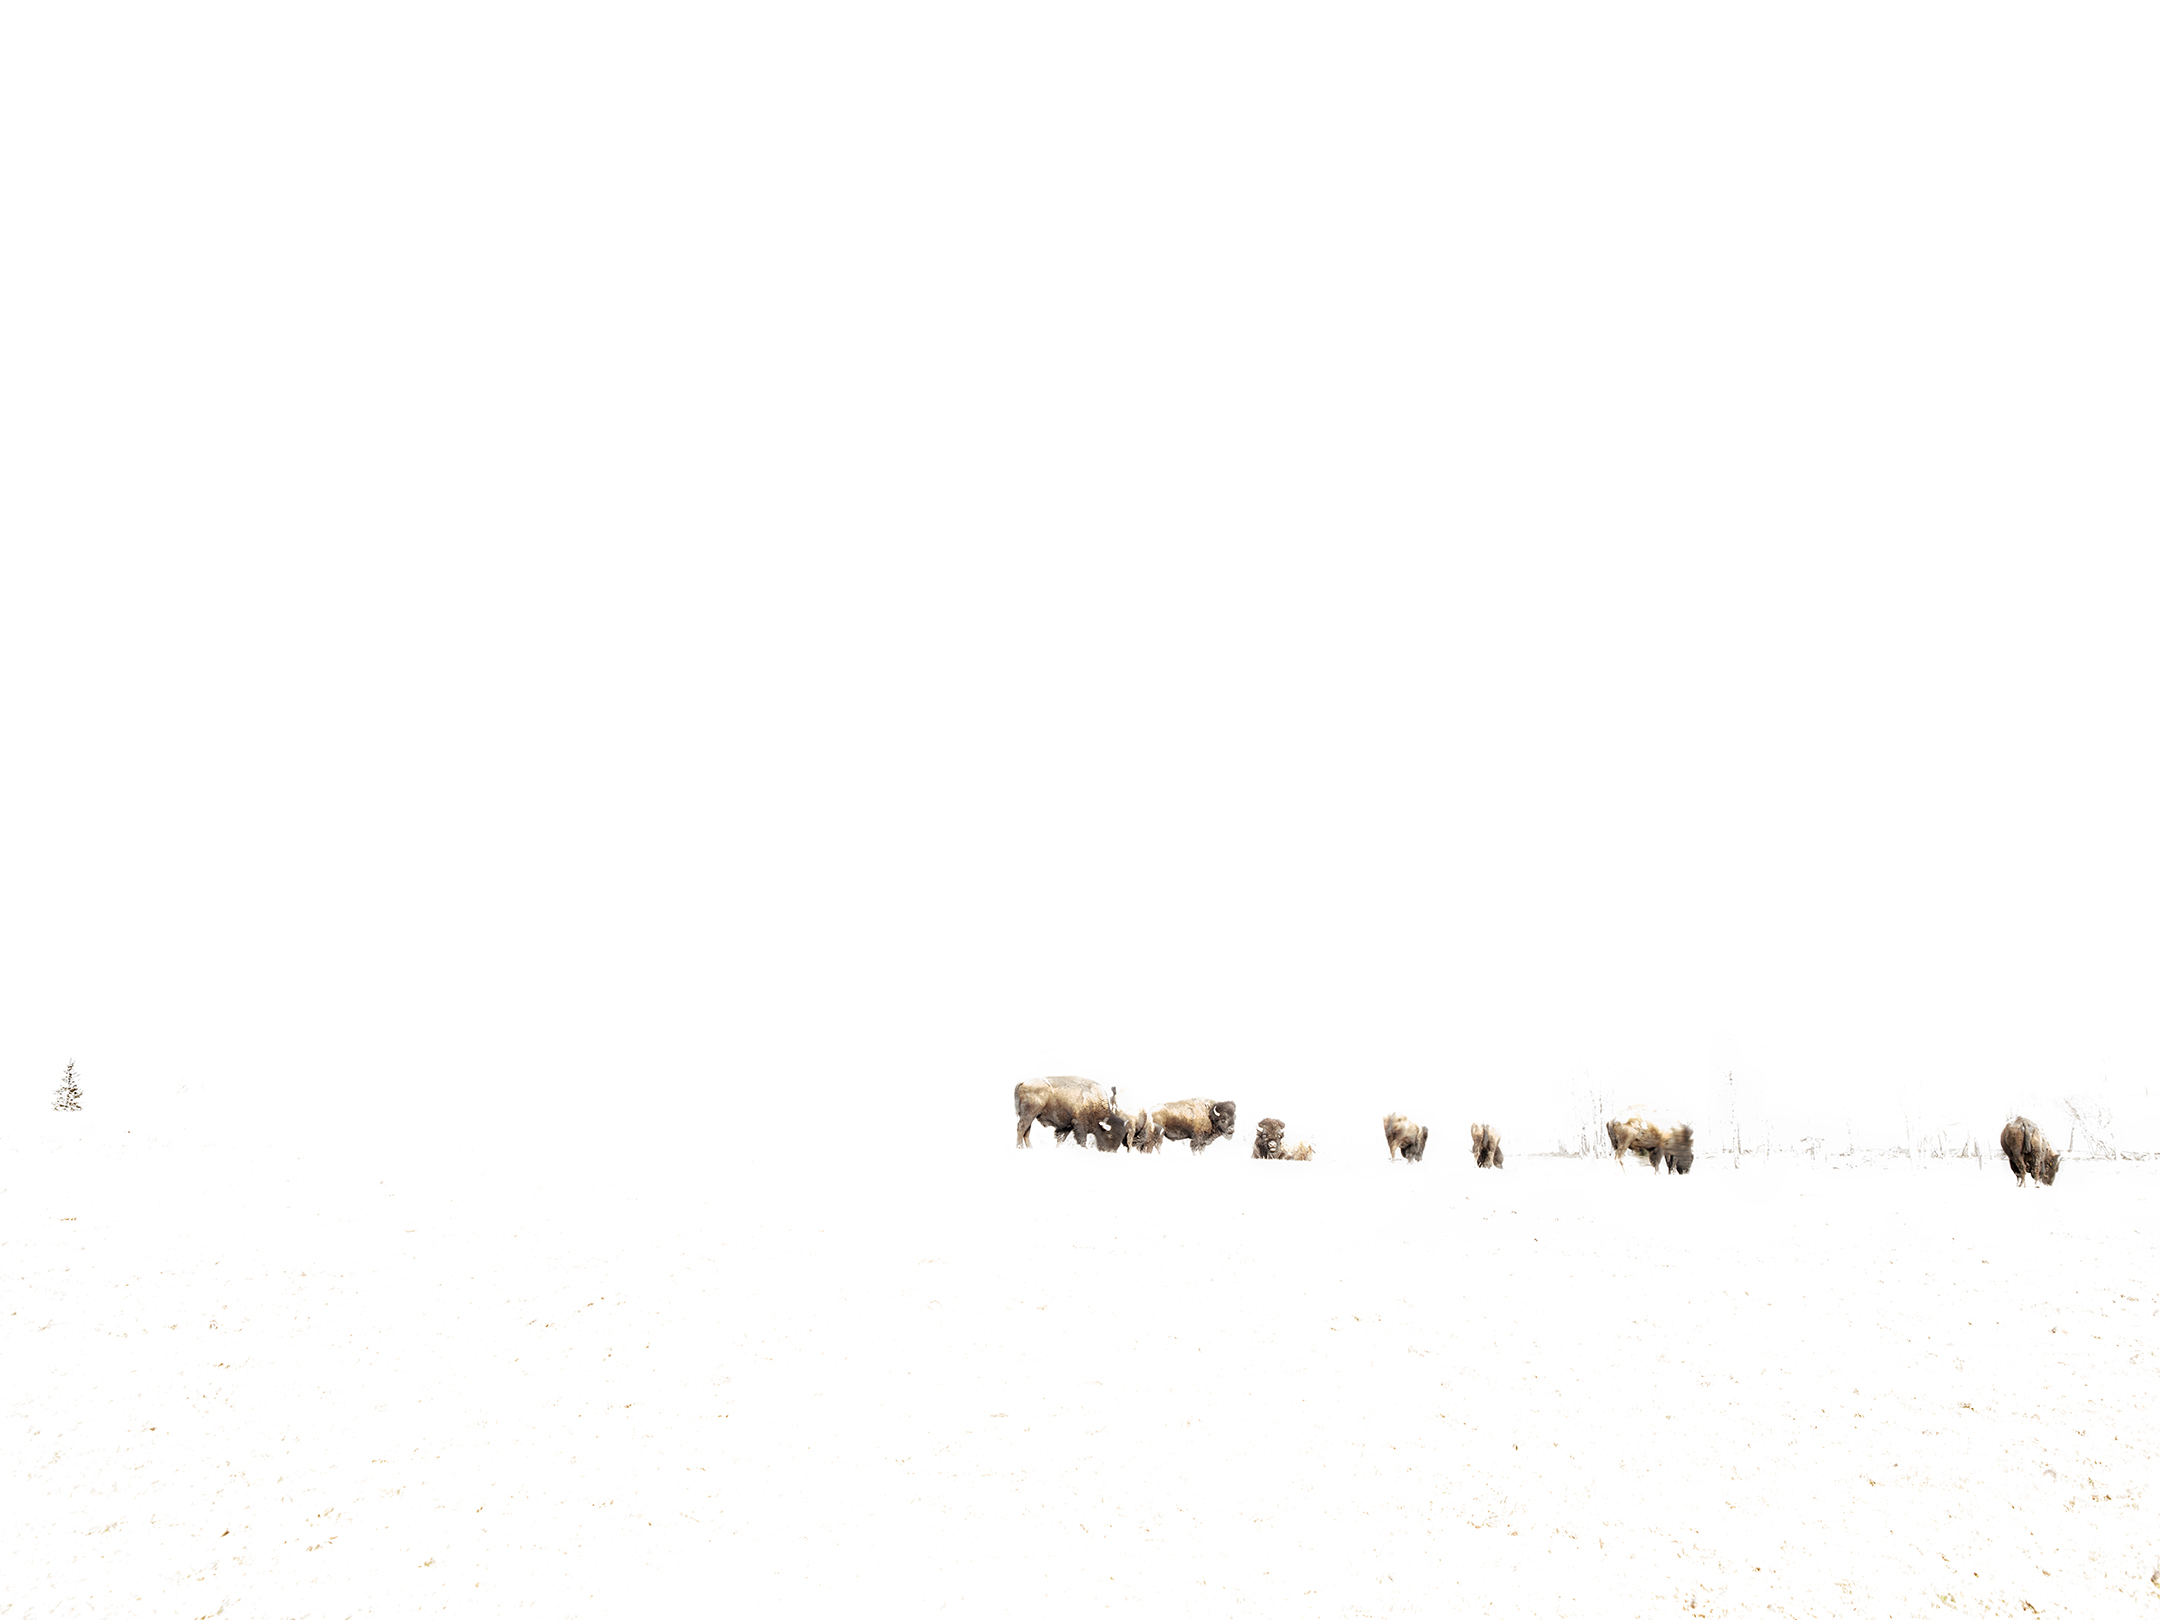 Buffalo Grazing in the Positive (2016)